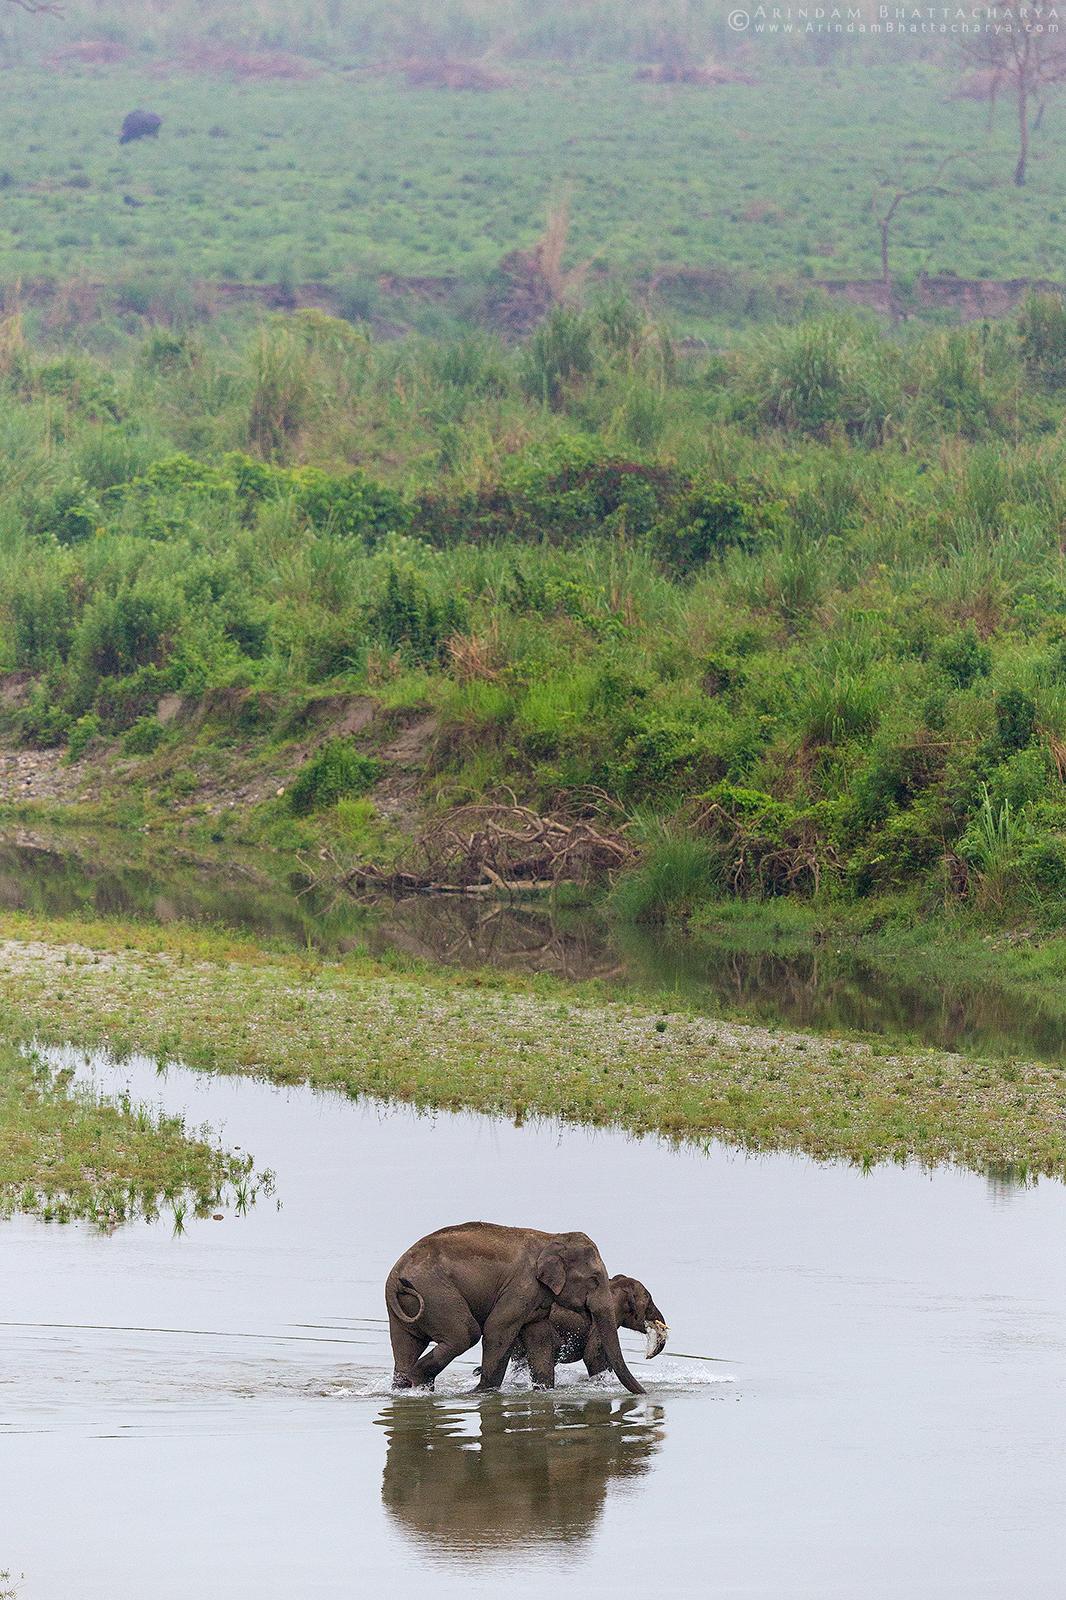 Asian elephant or Asiatic elephant or Elephas maximus crossing murti river at Gorumara National Park, West Bengal, India Arindam Bhattacharya